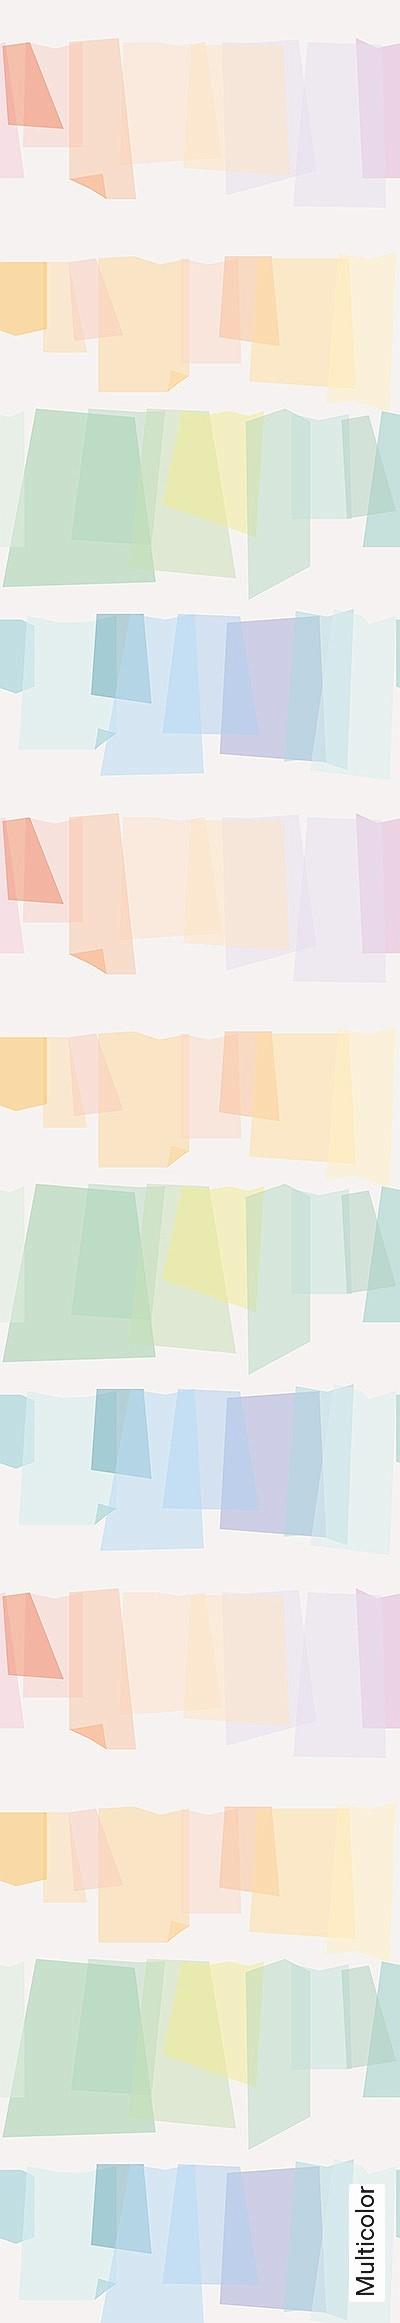 Multicolor-Schemen/Silhouetten-Moderne-Muster-Weiß-Multicolor